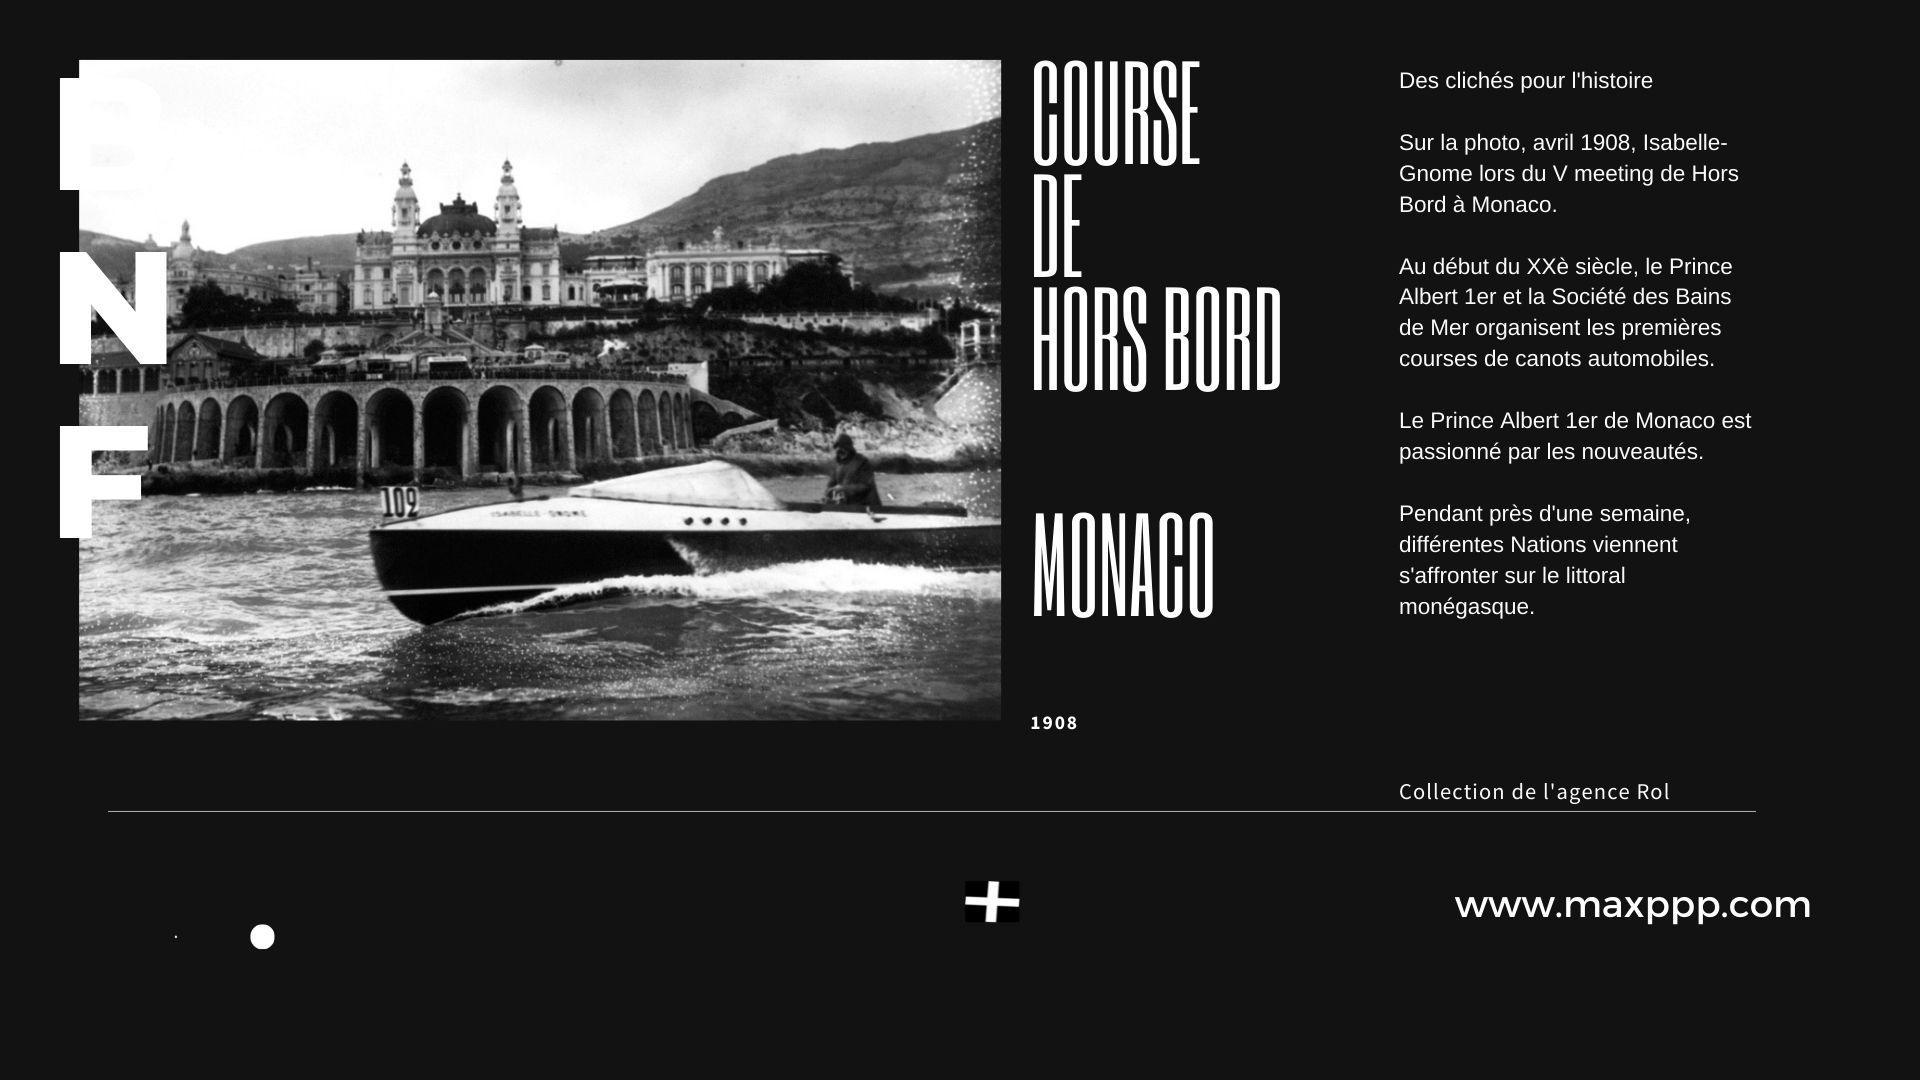 Monaco, meeting de Hors Bord, 1908